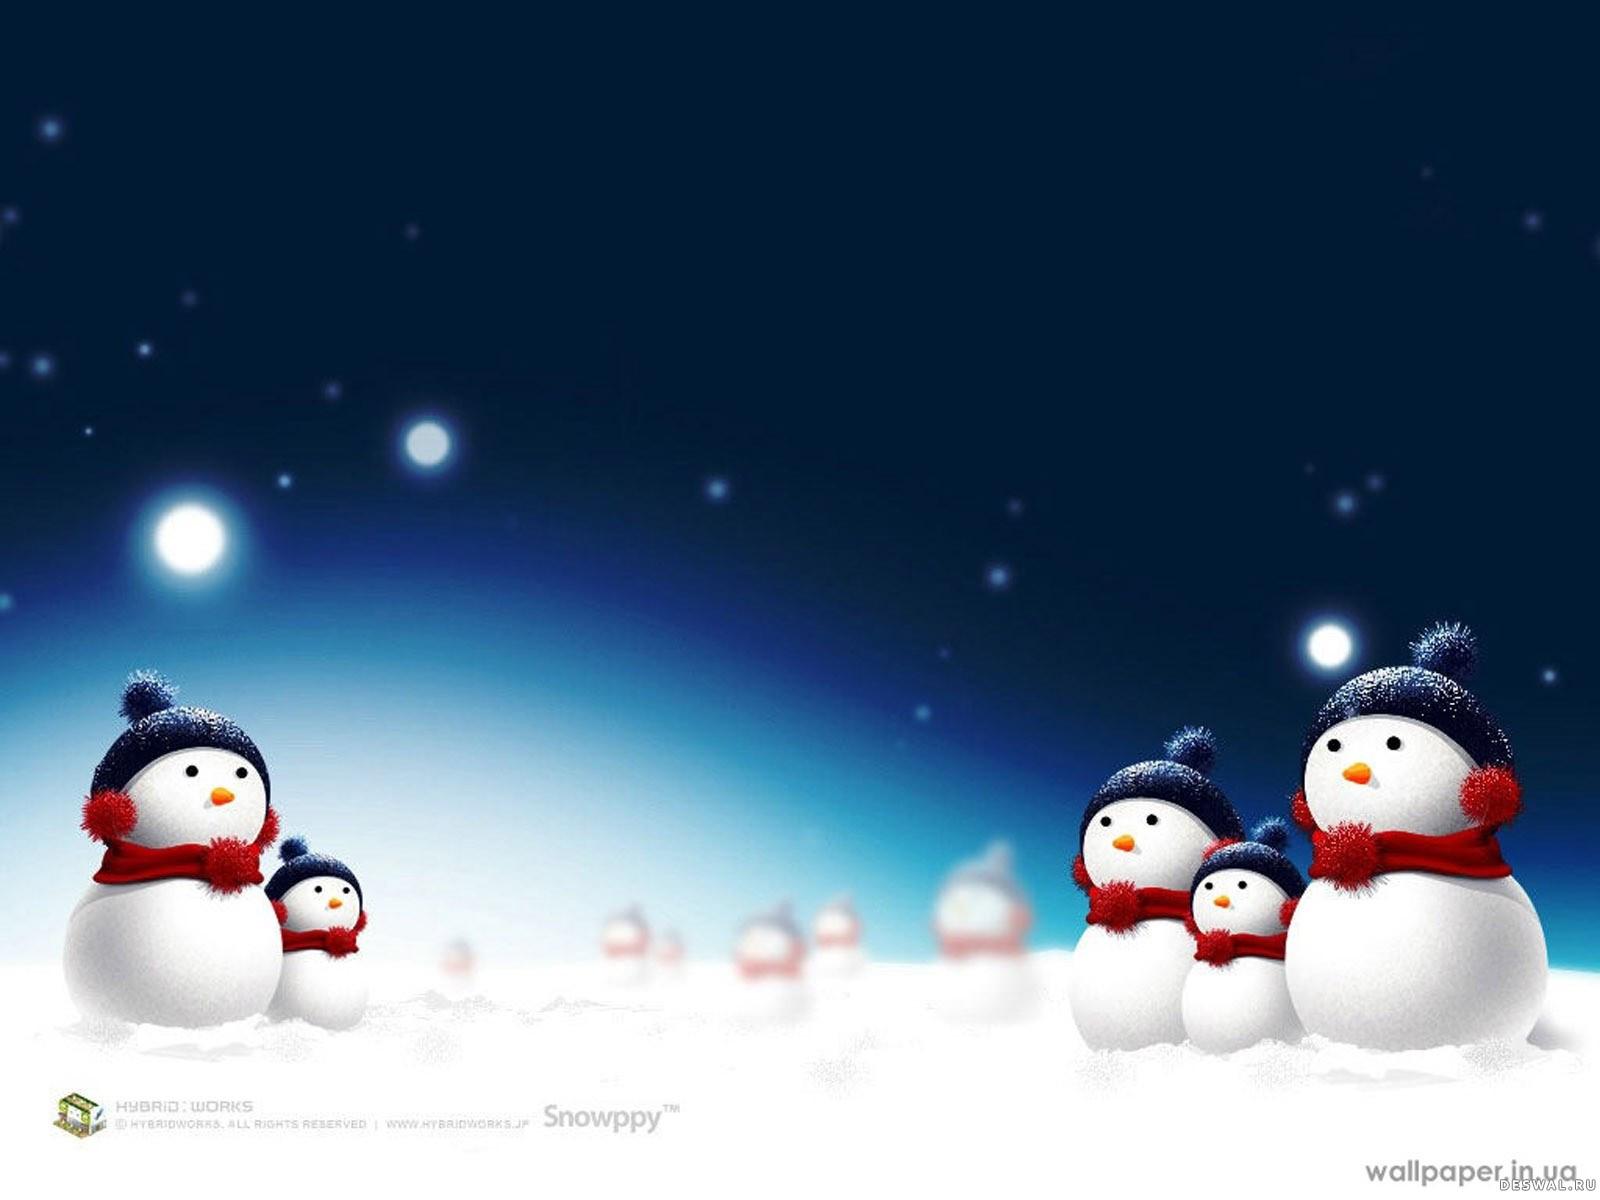 Снеговички в шапках и шарфах